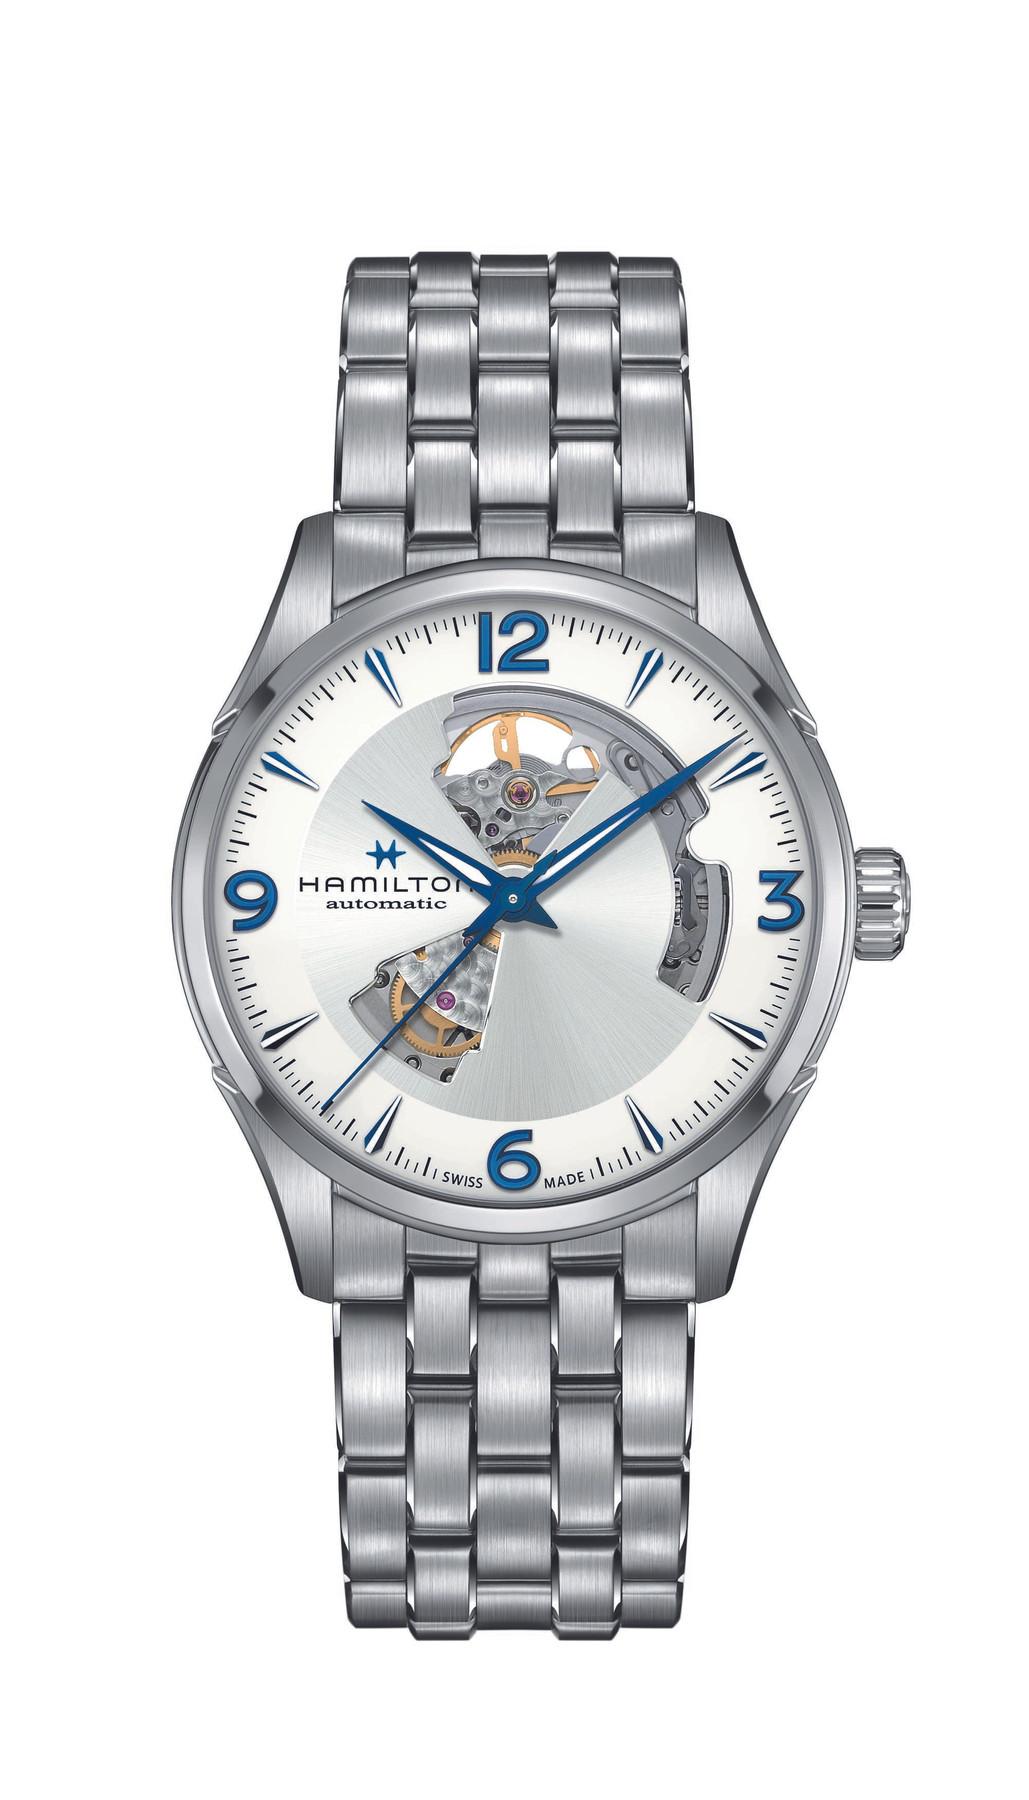 Hamilton H32705152   Jazzmaster   Open Heart Automatic watch